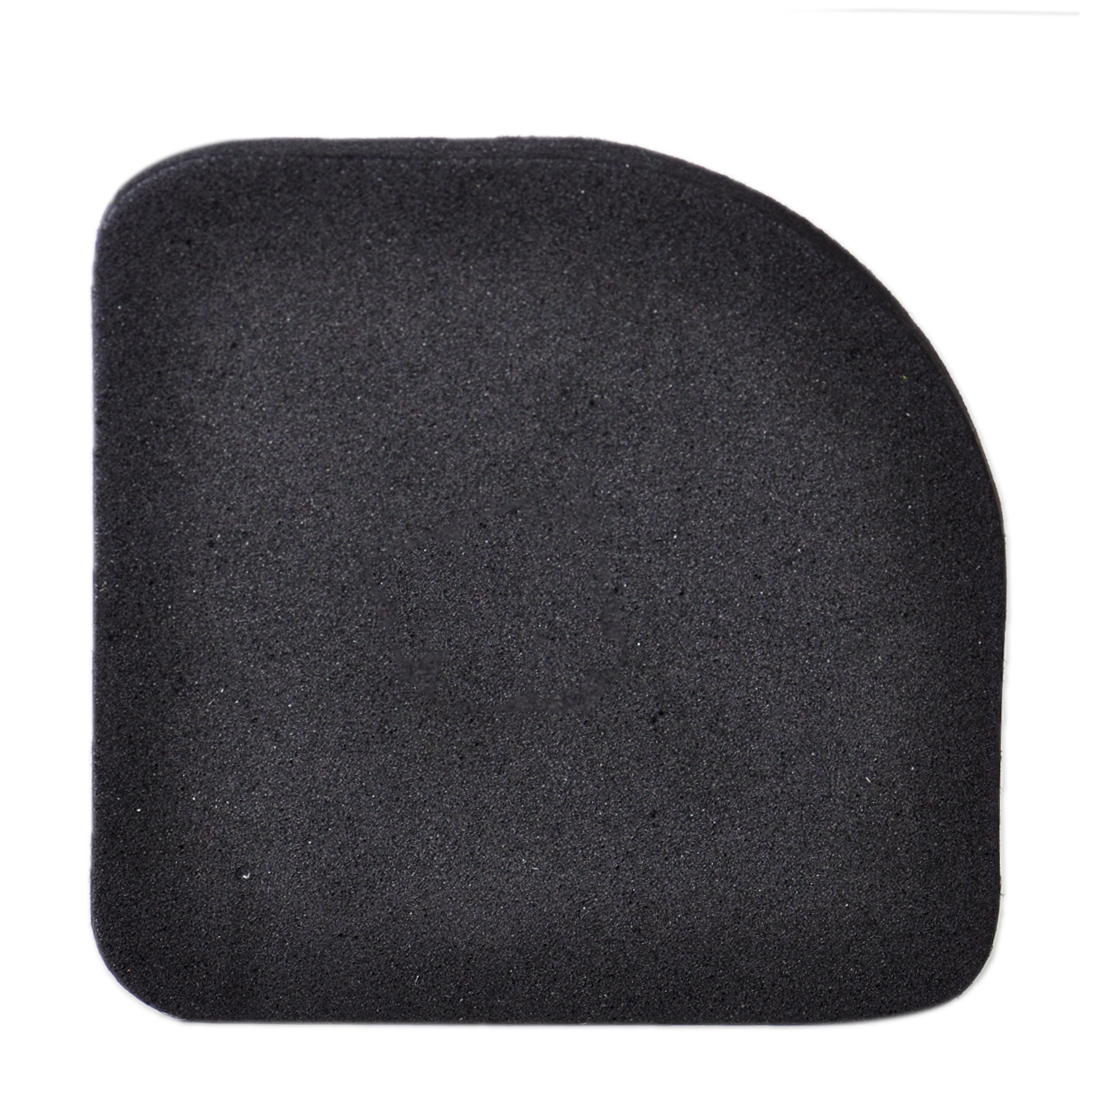 neu 4 stk waschmaschine matte nterlage antivibration pad. Black Bedroom Furniture Sets. Home Design Ideas